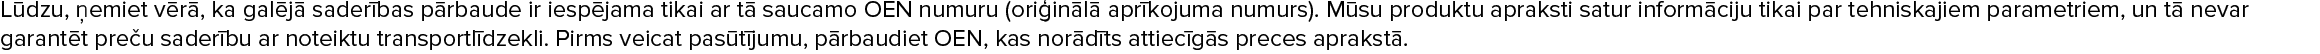 LIQUI MOLY P000384, 30 741 424, VO509Z405E Stūres pastiprinātāja eļļa